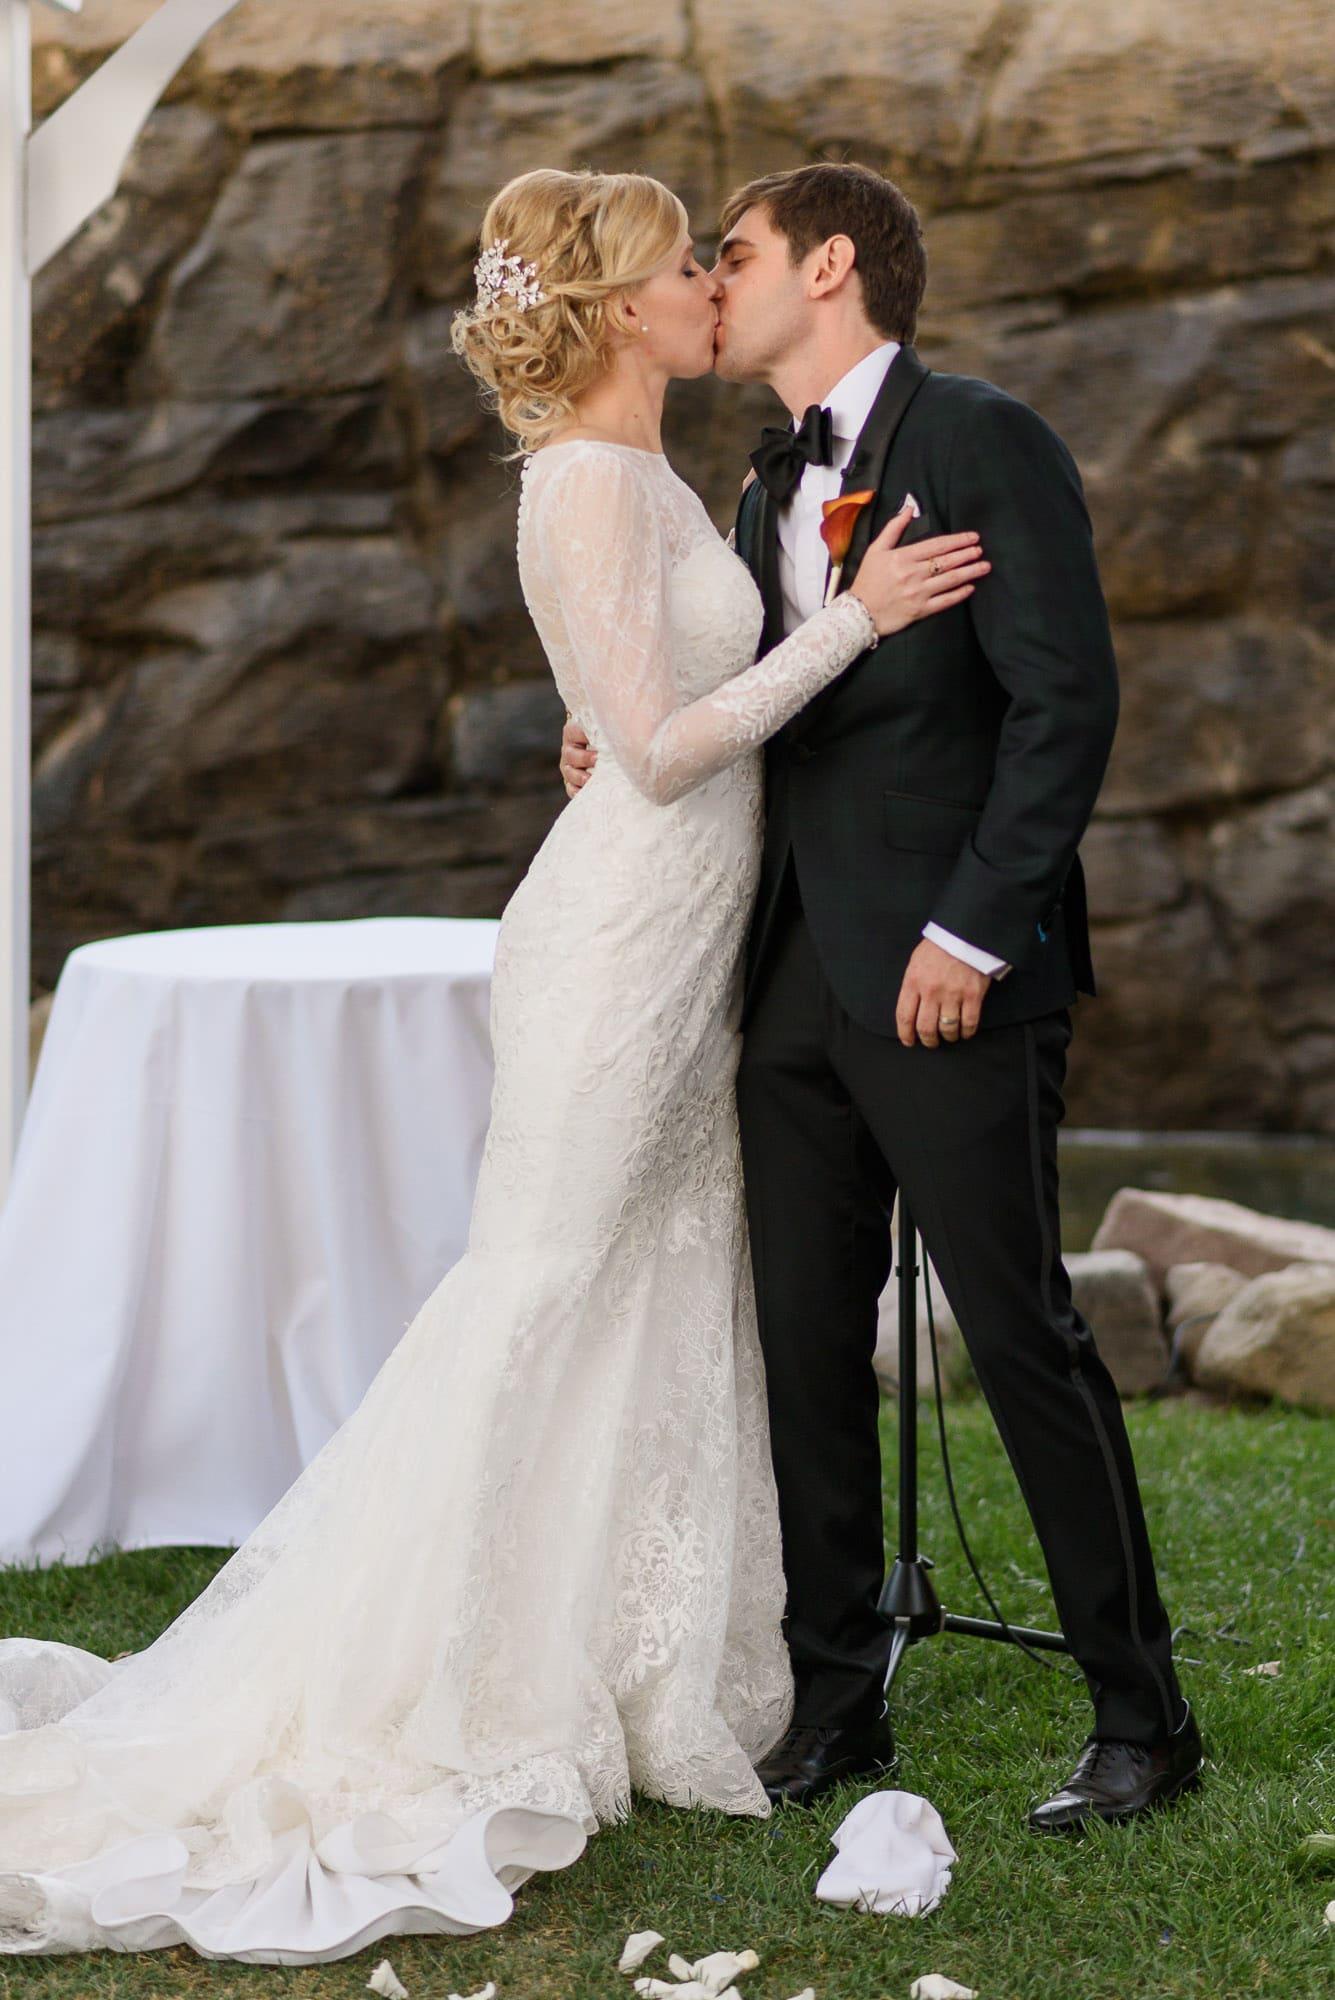 057_Alan_and_Heidi_Los_Angeles_Equestrian_Center_Wedding